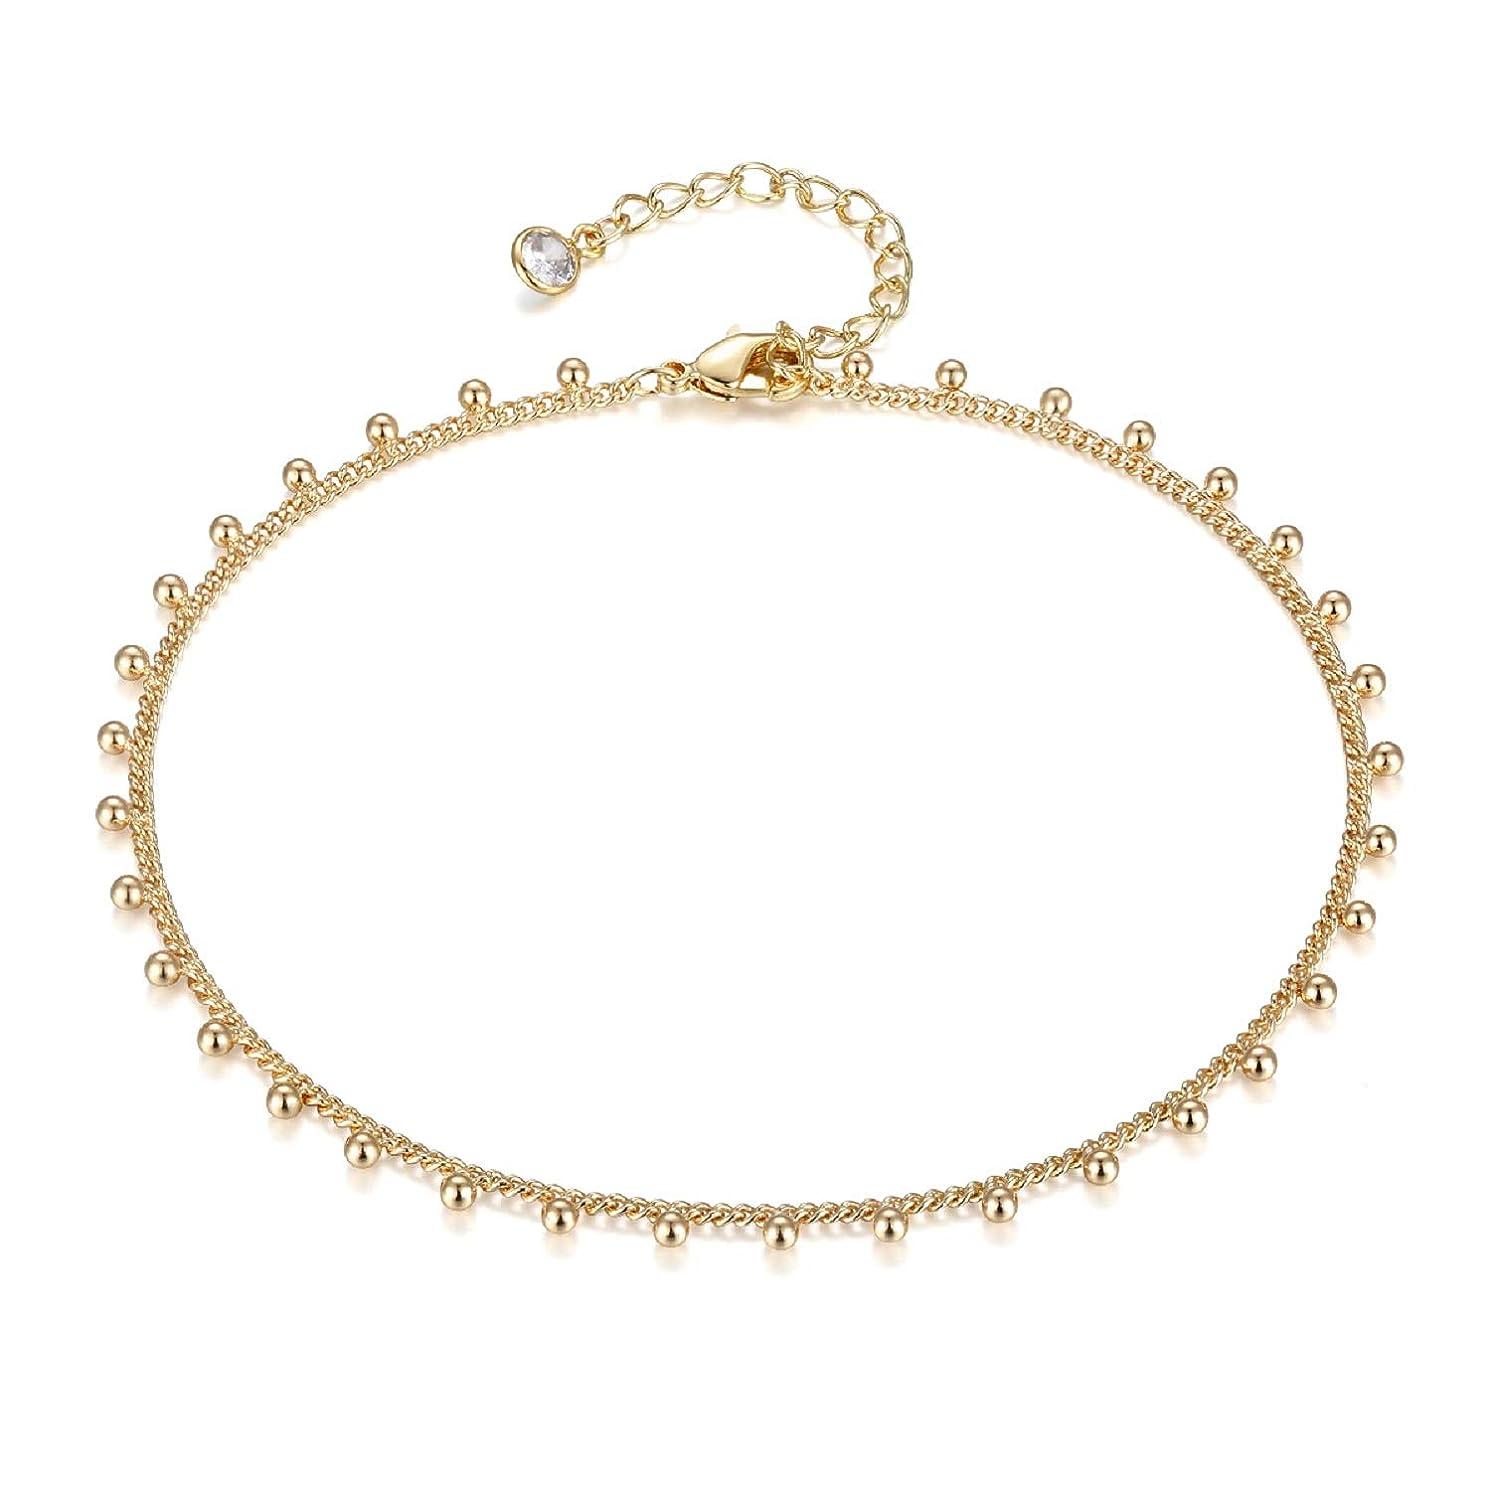 LOYATA Dainty Ankle Bracelet, 14K Gold Plated Link Chain Anklet Cute Elephant Evil Eye Delicate Star Tiny Cross Foot Chain Jewelry Boho Ankle Bracelets for Women